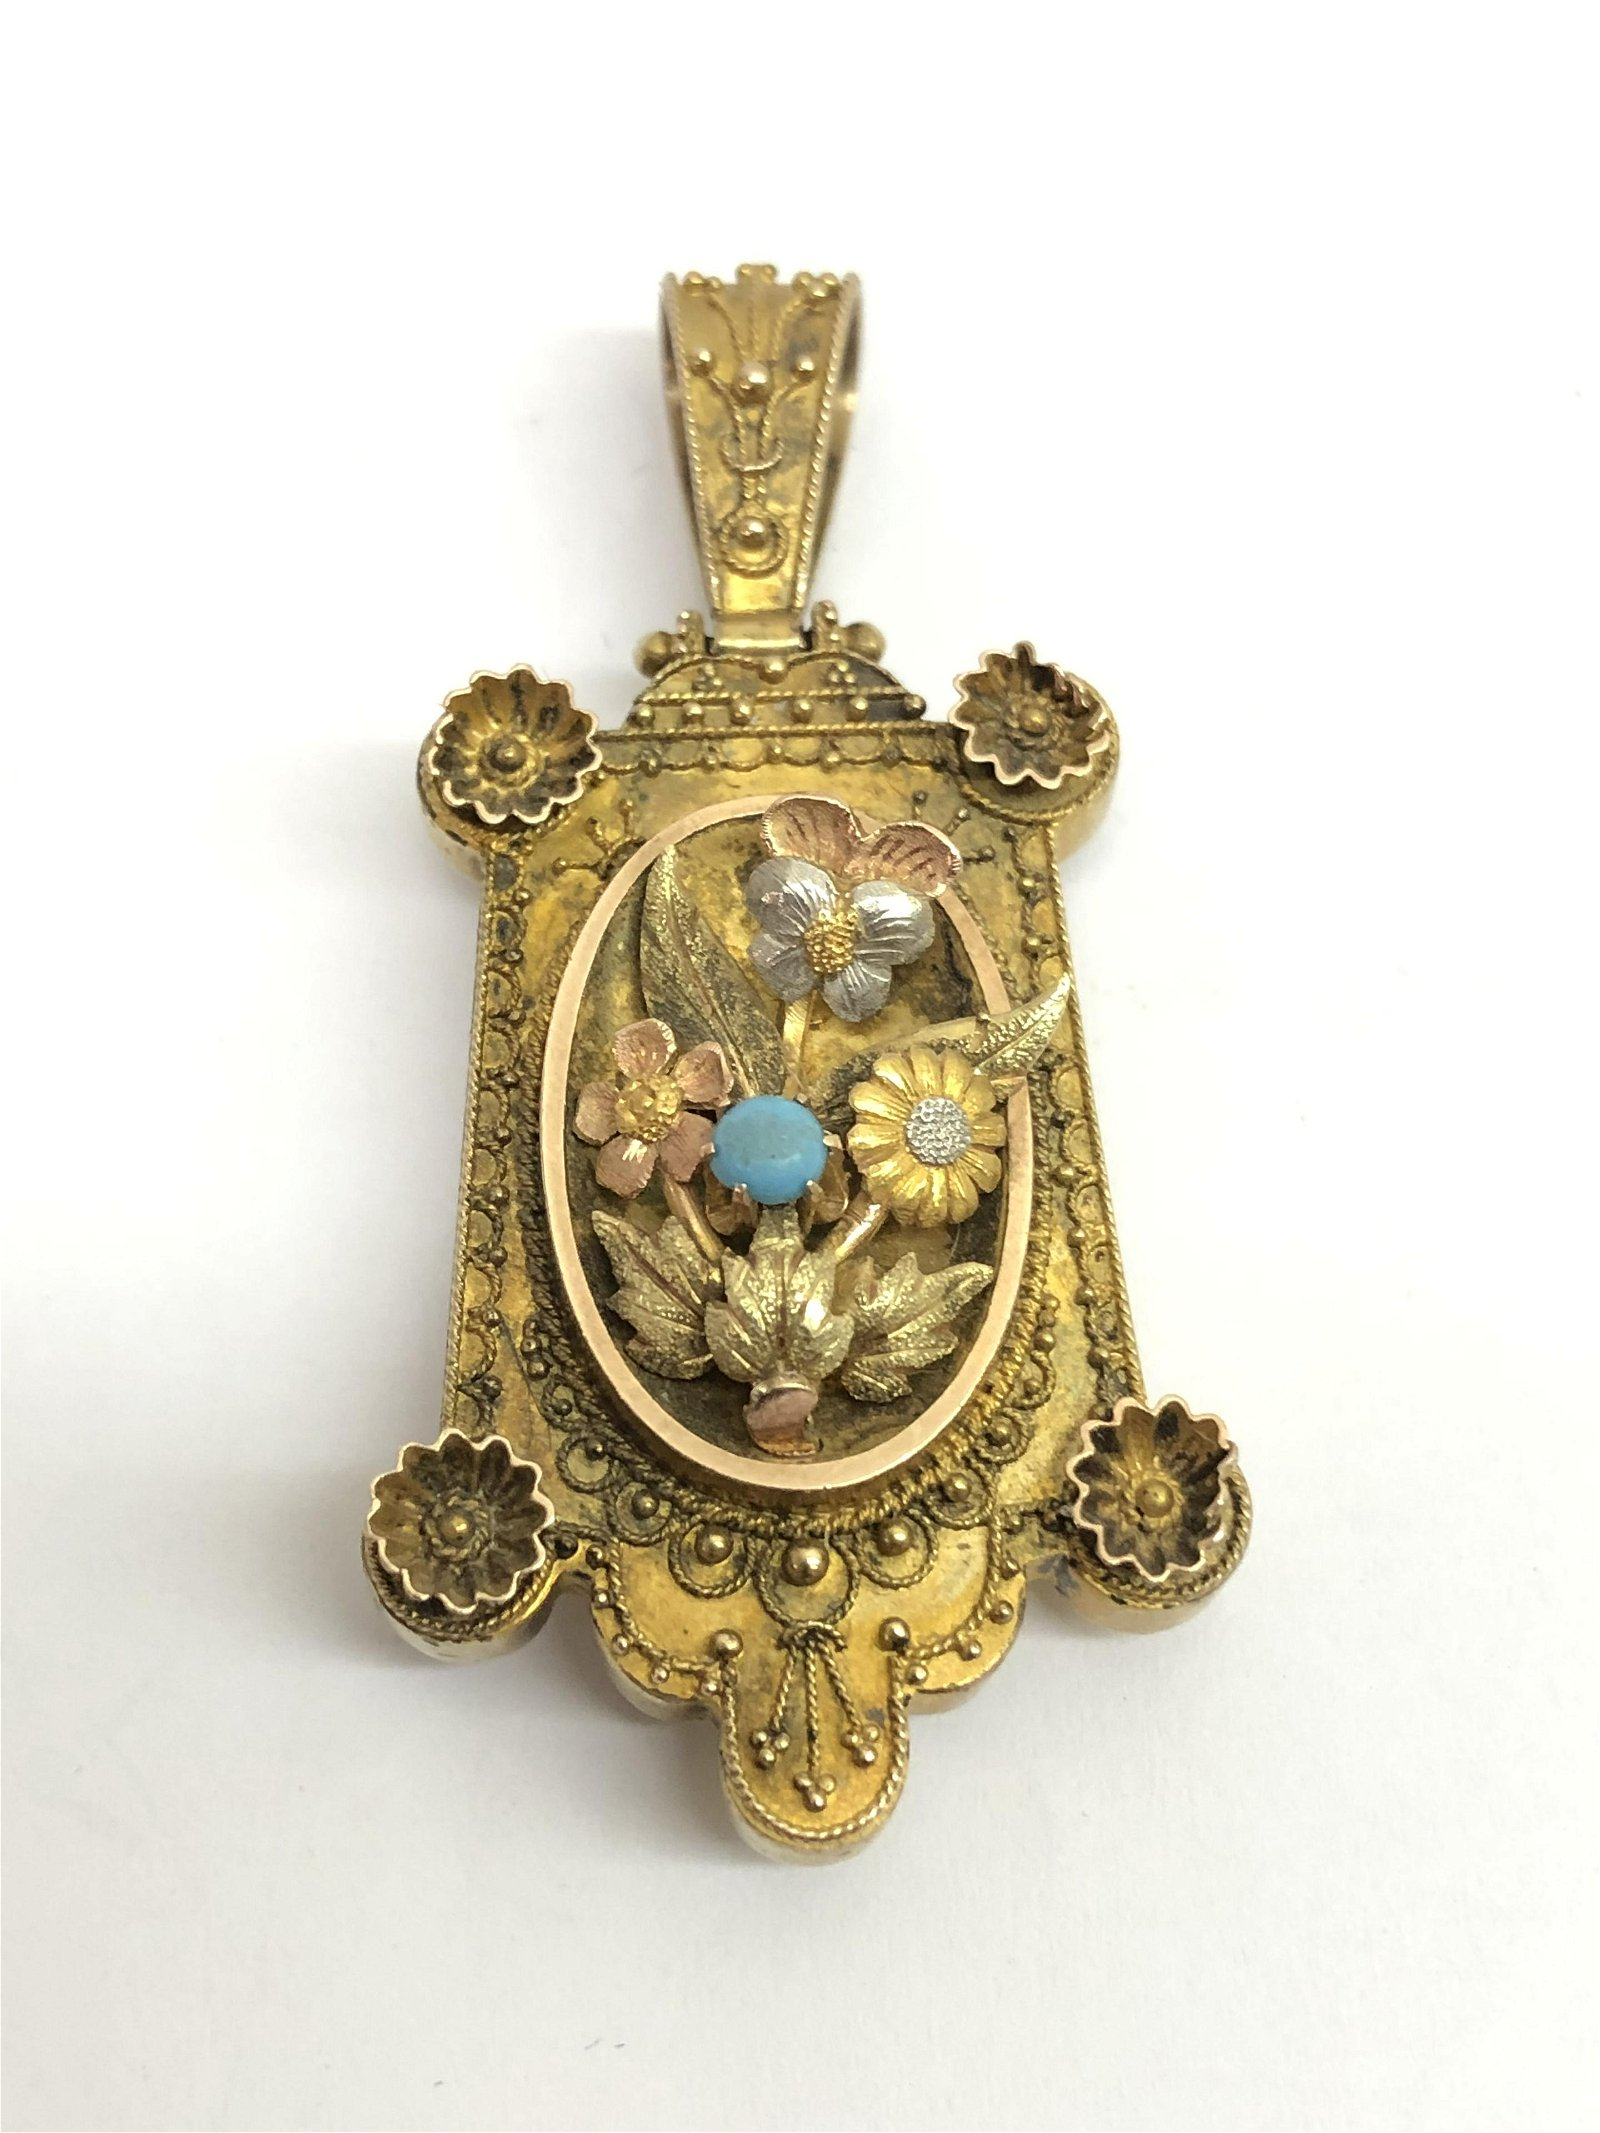 Victorian Etruscan Revival 14K Gold Locket - Ornate w/